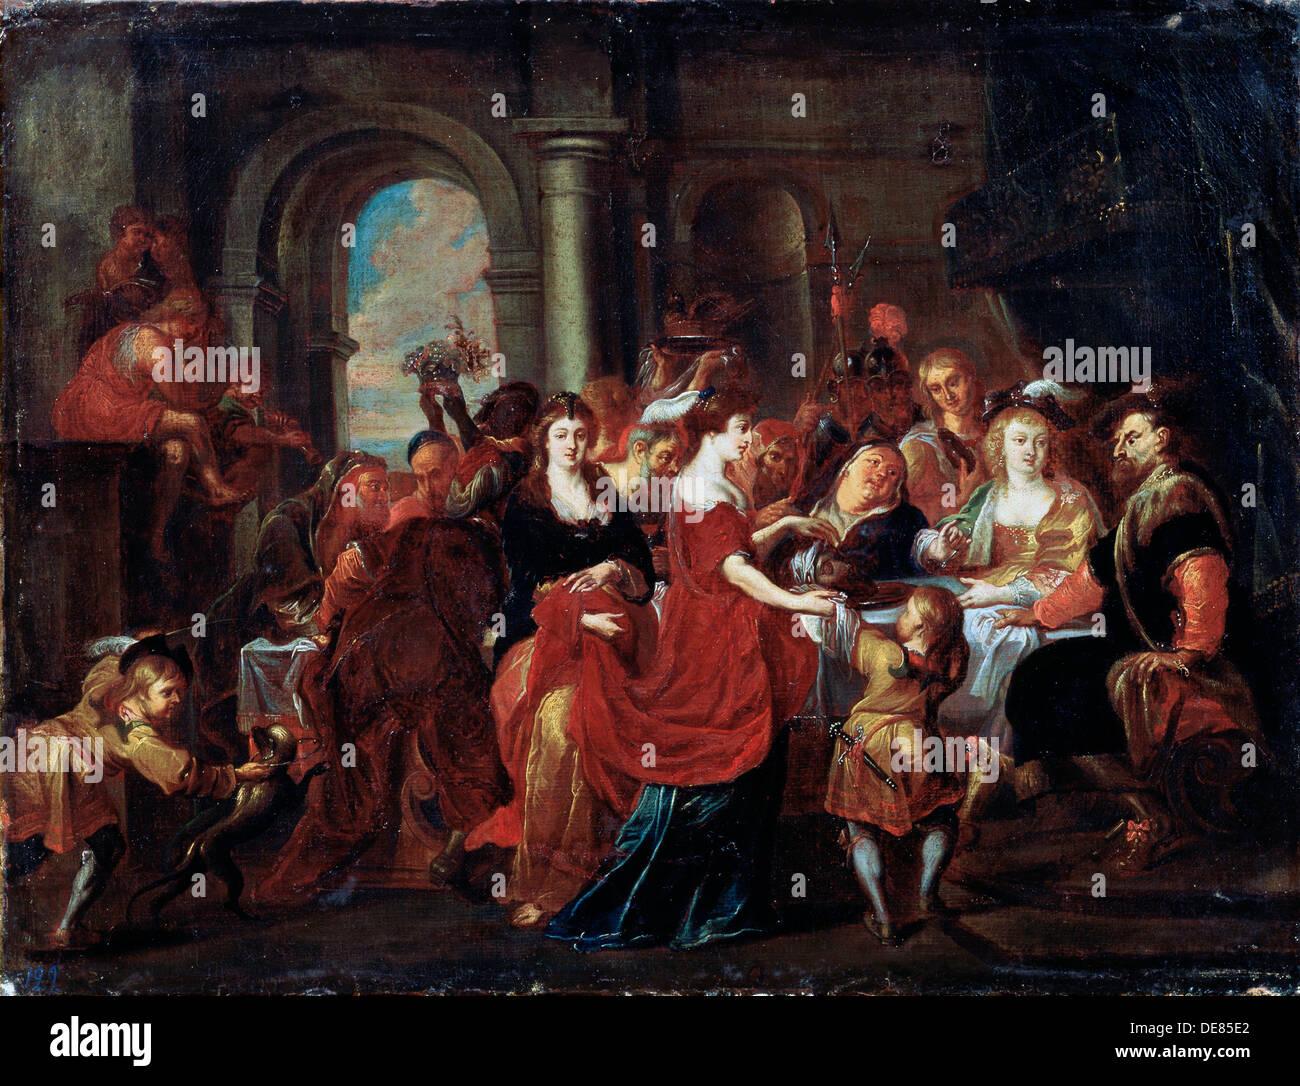 'The Feast of Herod', 17th century.  Artist: Abraham Jansz van Diepenbeeck - Stock Image